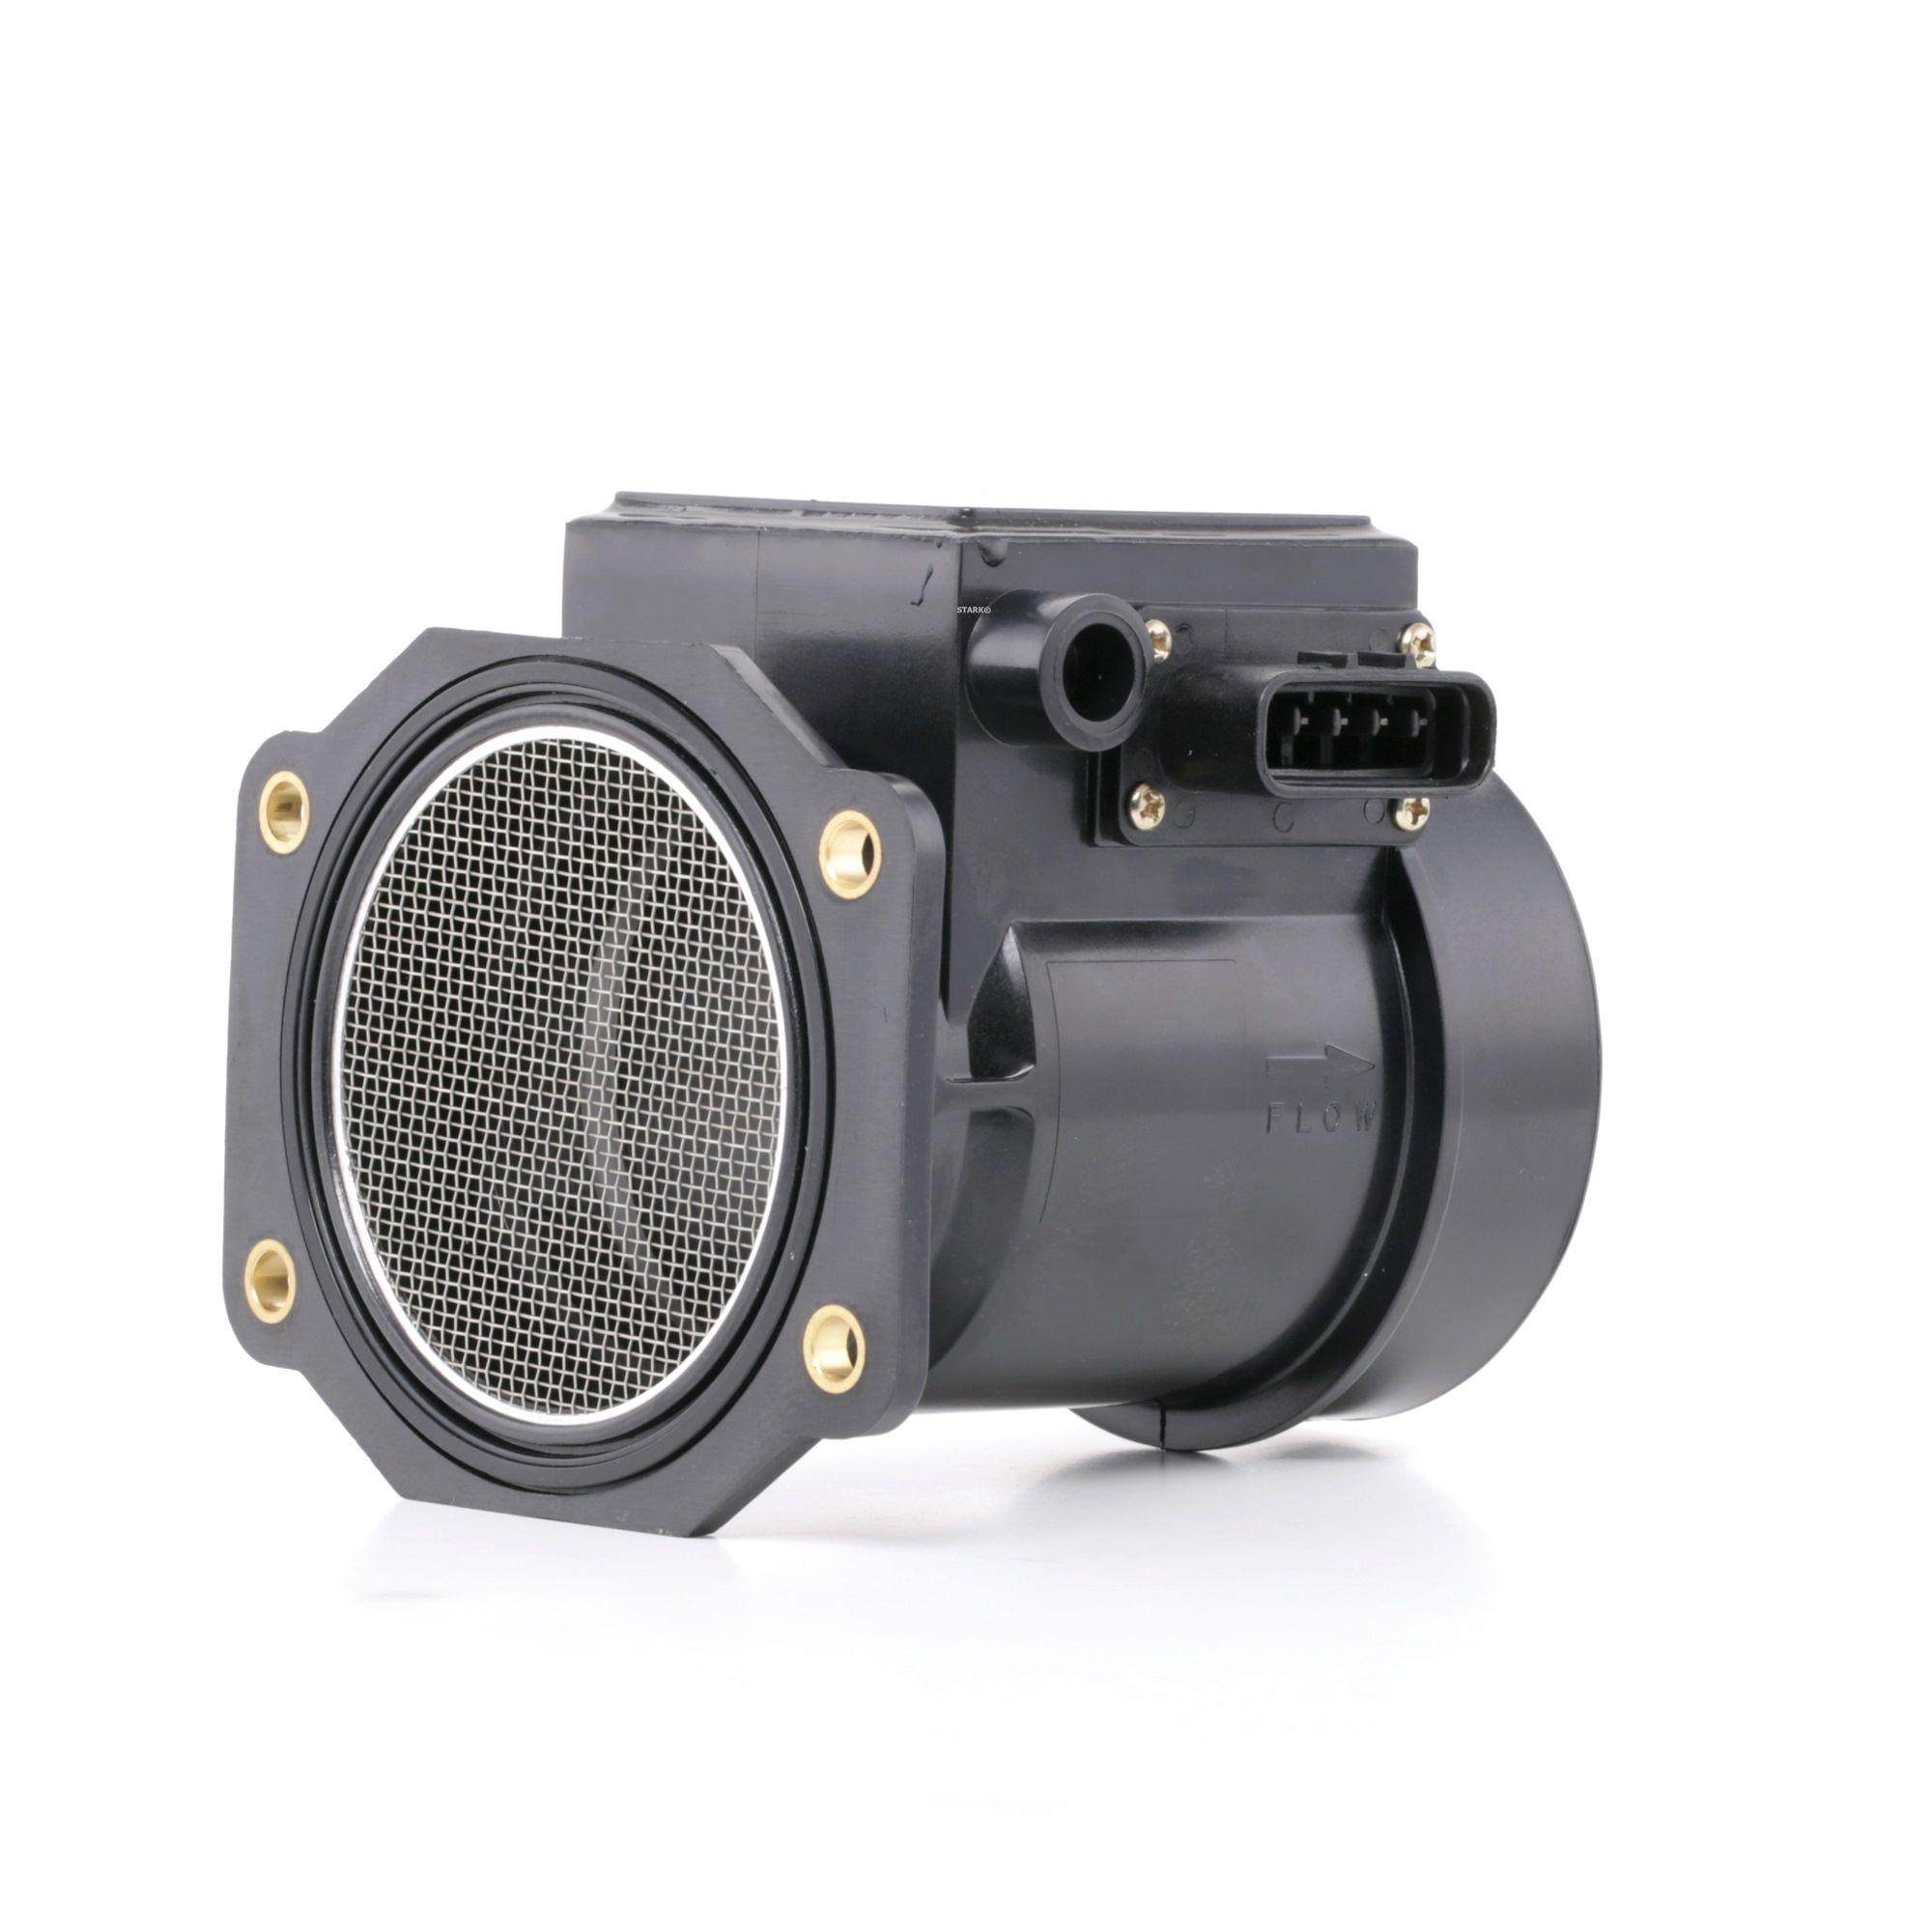 25 Werte x 5pcs = 125pcs Elektrolyt Kondensator Sortiment Kit Low Voltage 1uF-2200uF mit Box f/ür elektronische DIY